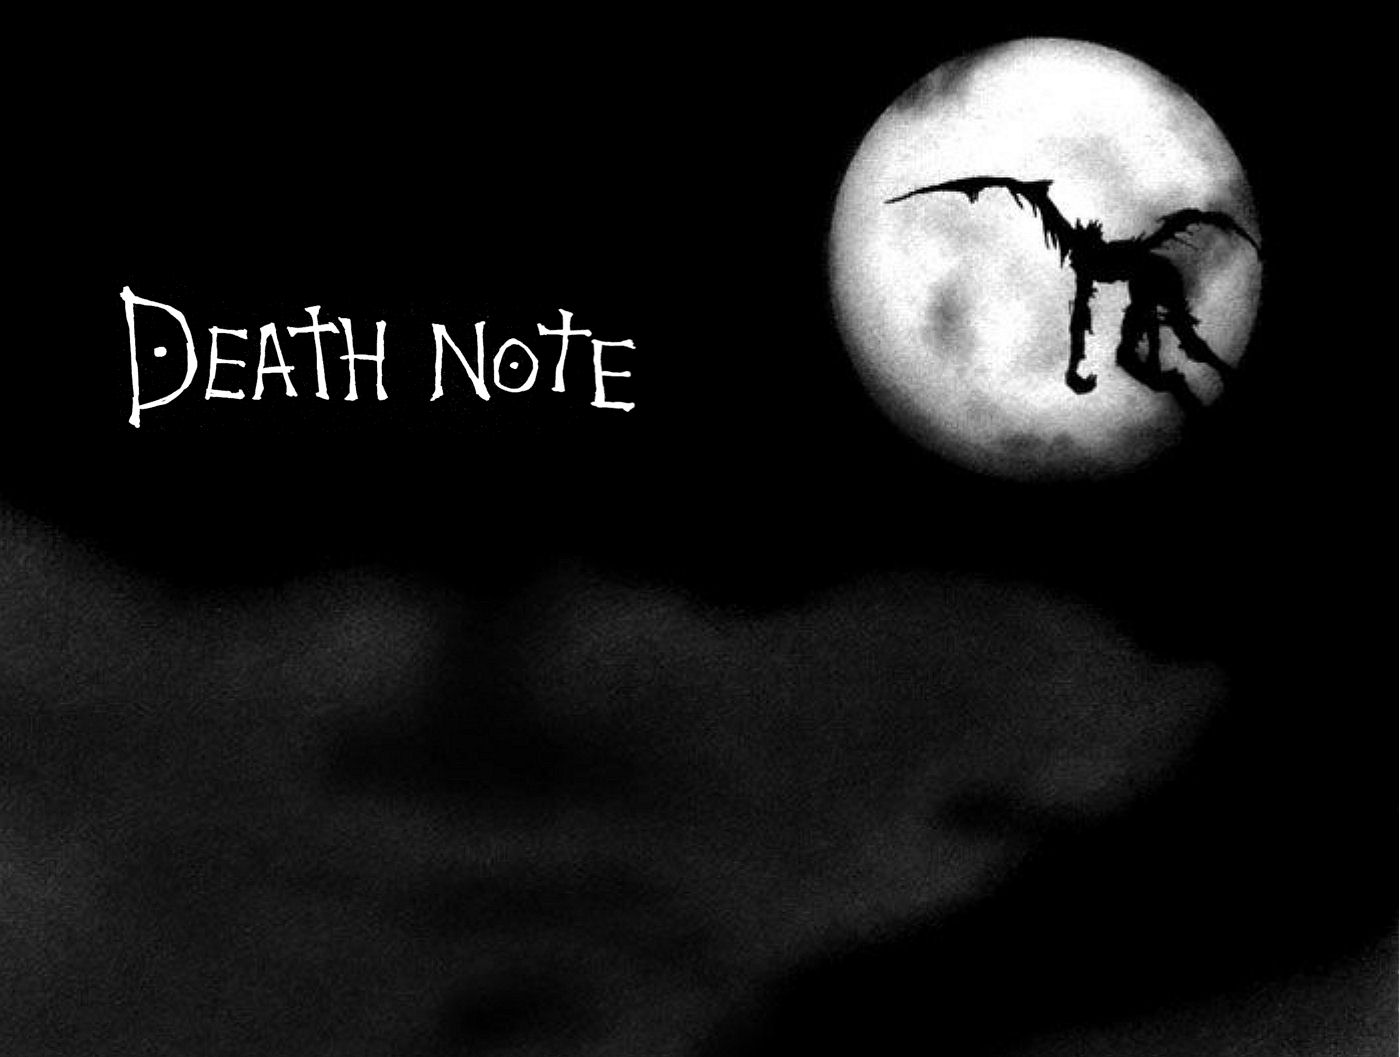 47+ Death Note Wallpaper iPhone on WallpaperSafari